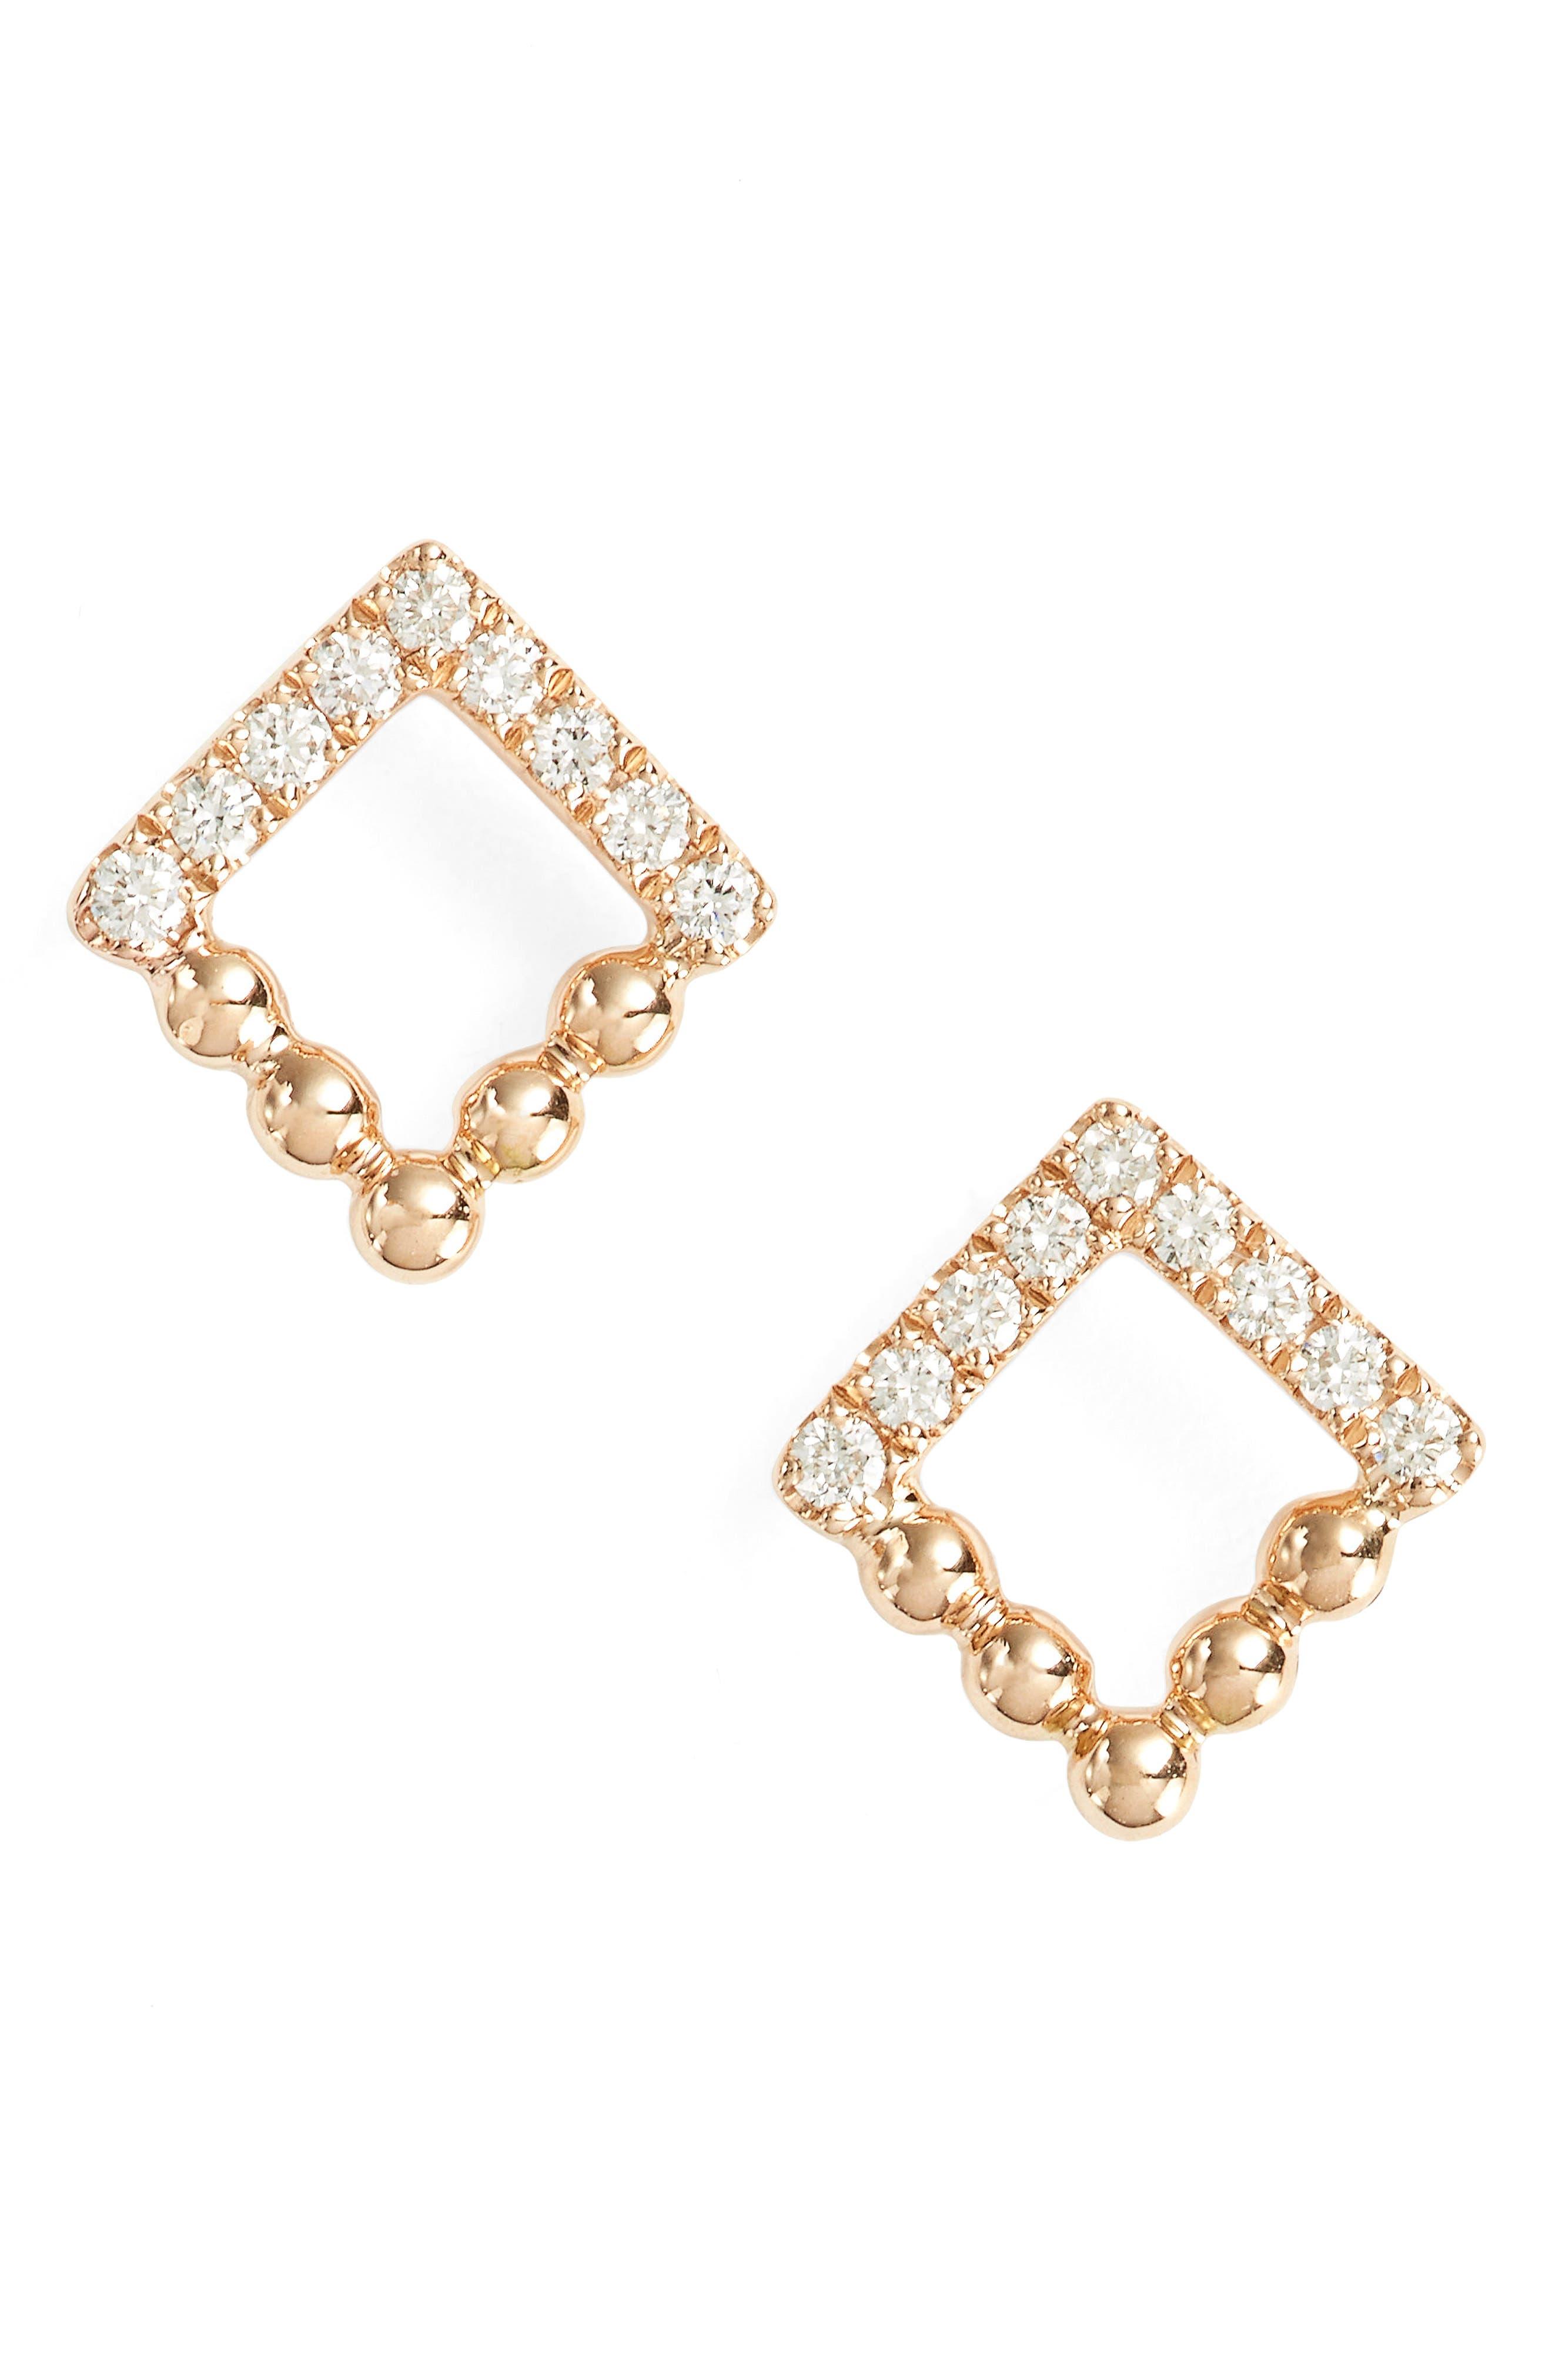 Alternate Image 1 Selected - Dana Rebecca Designs Poppy Rae Square Diamond Stud Earrings